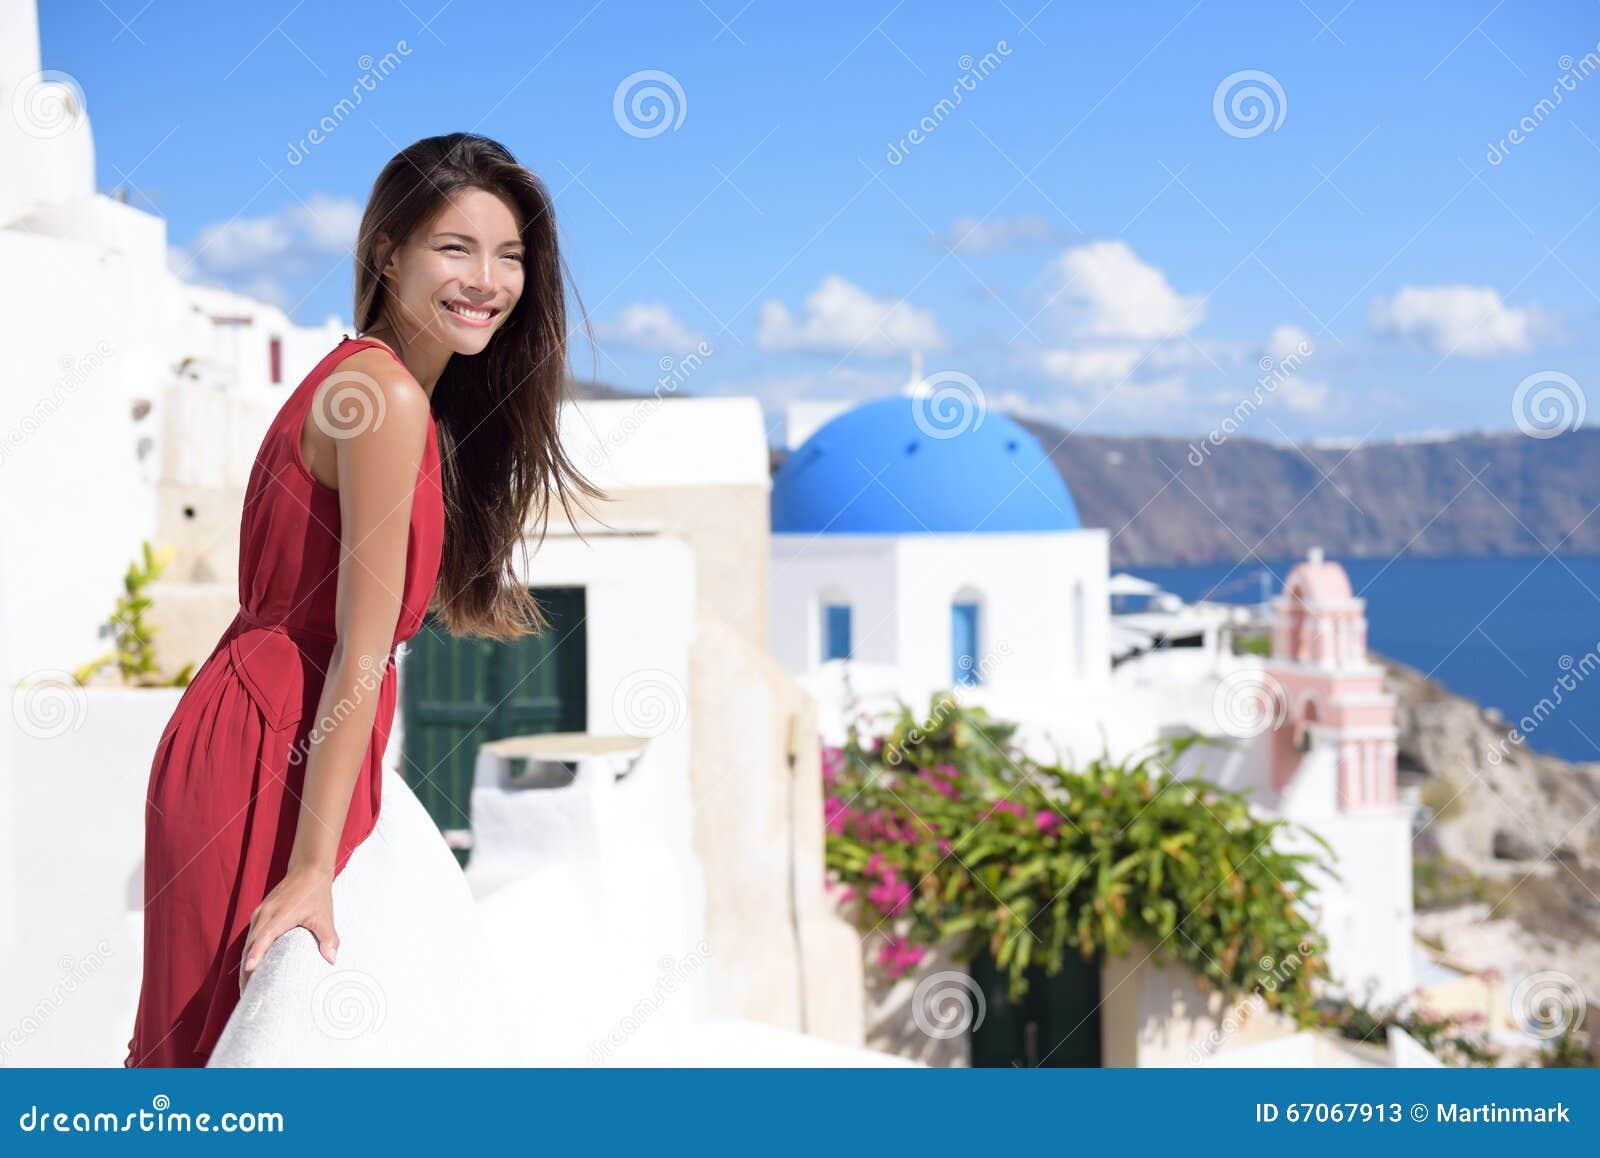 Santorini tourism - Asian woman on summer travel